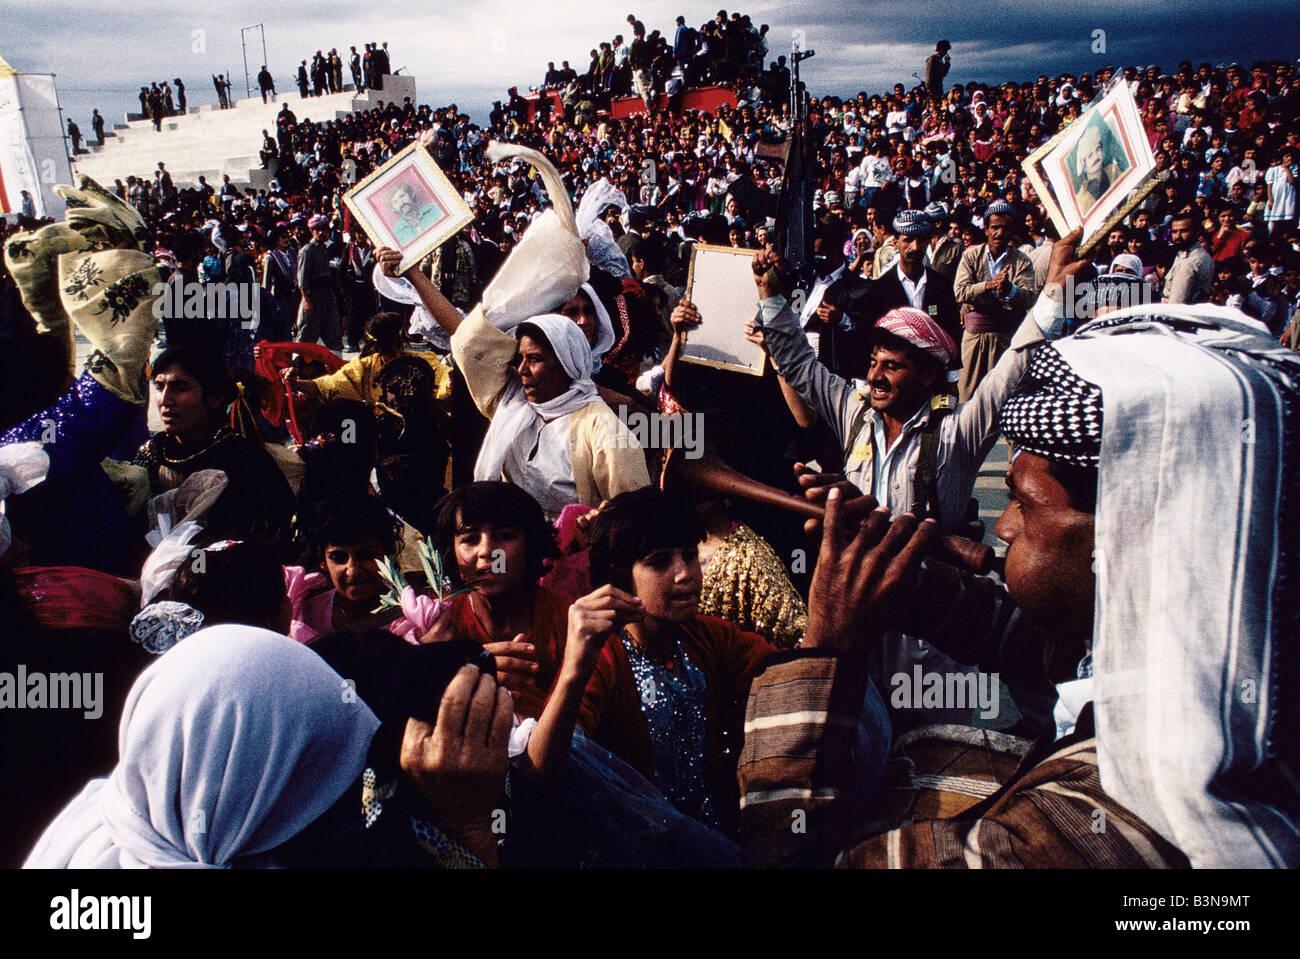 Jubilant Crowd Jubilant Crowd at a Rally Held